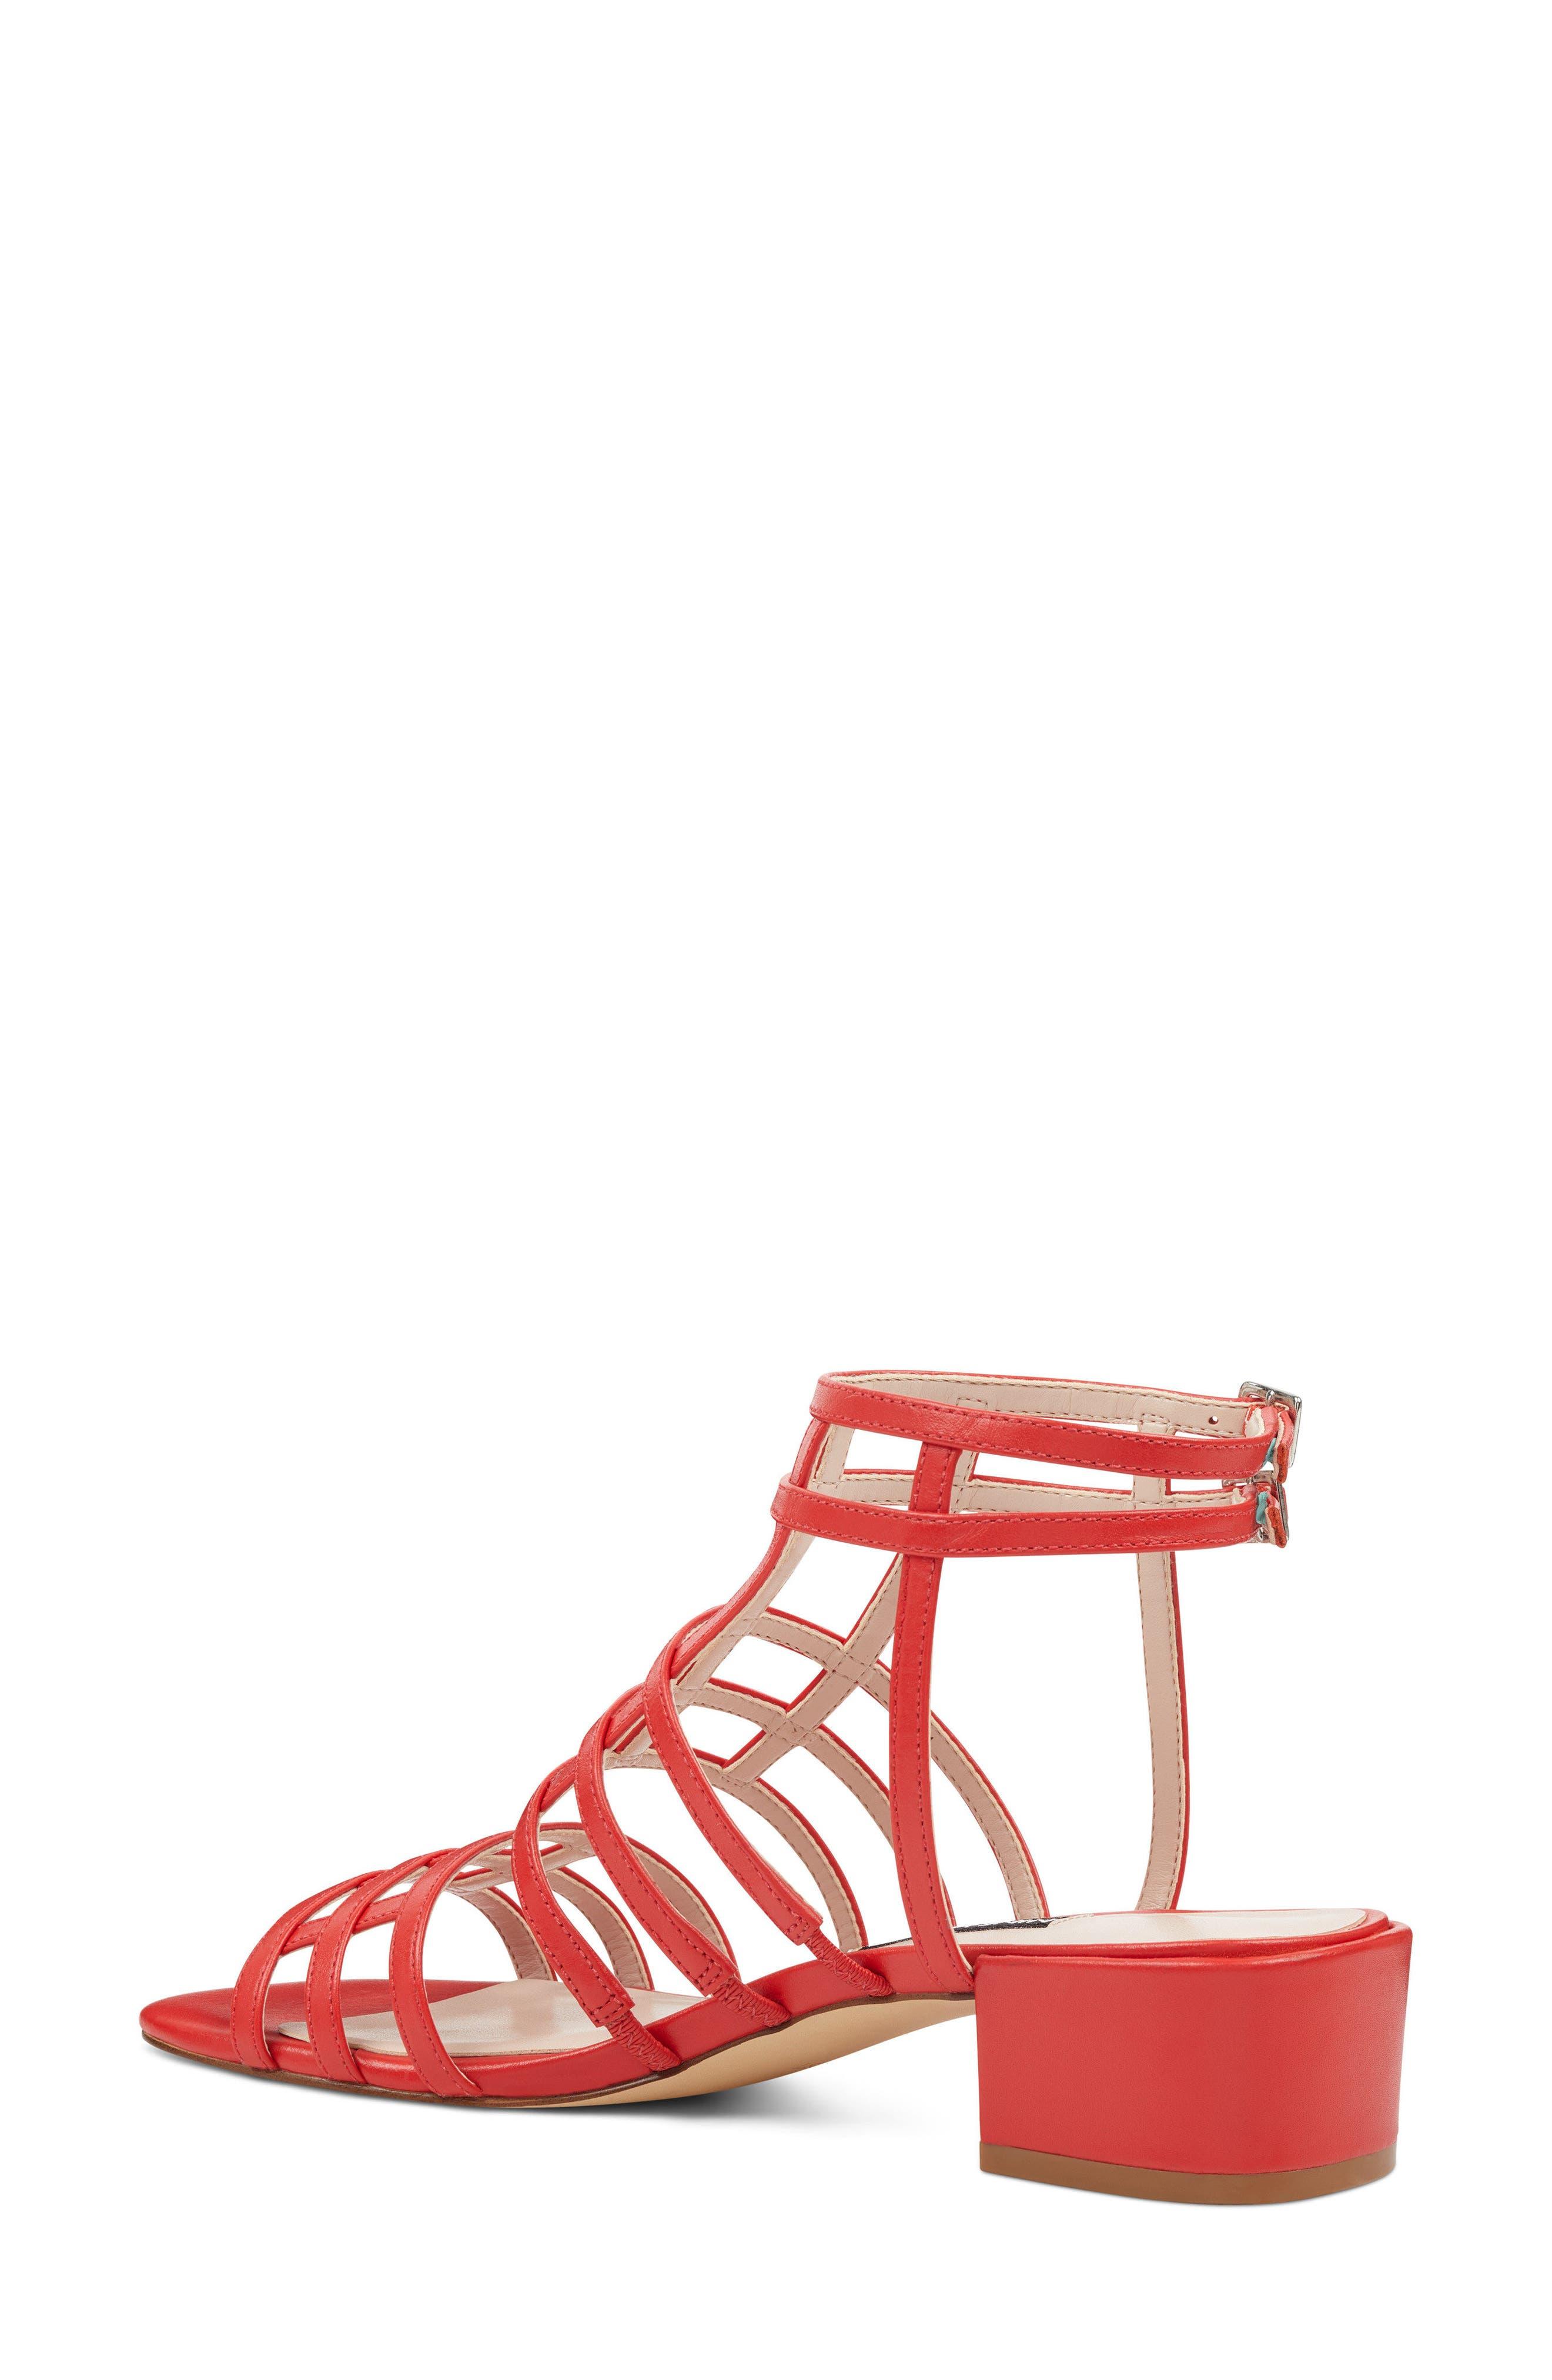 Xerxes Sandal,                             Alternate thumbnail 2, color,                             Red Leather